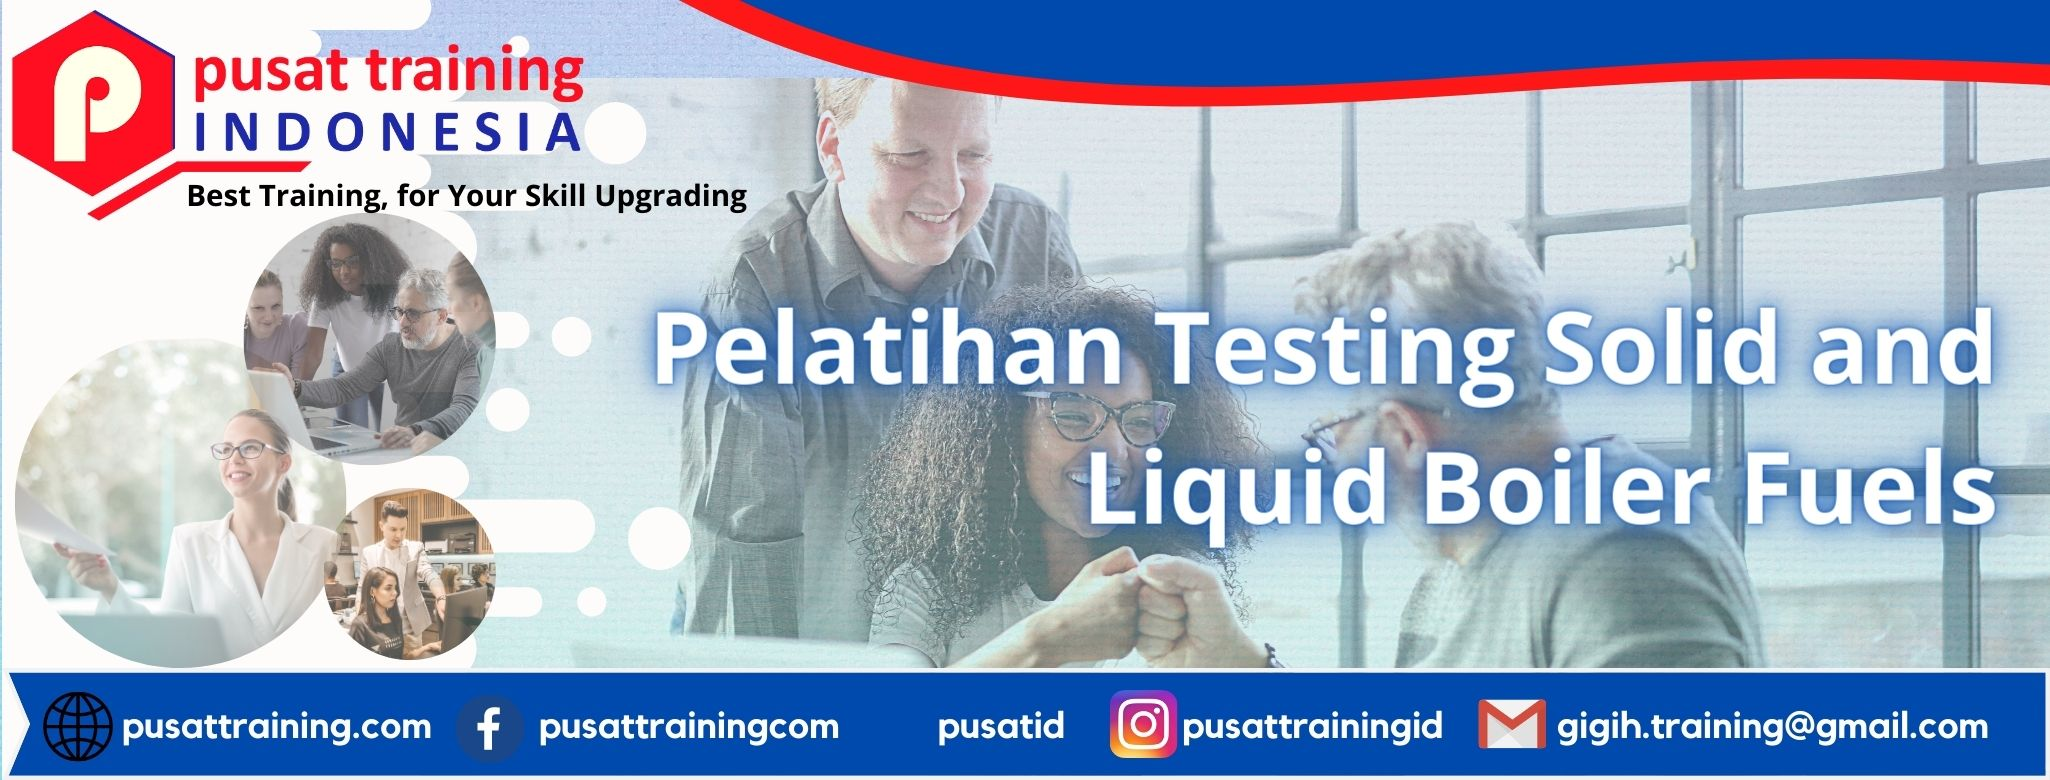 Pelatihan-Testing-Solid-and-Liquid-Boiler-Fuels